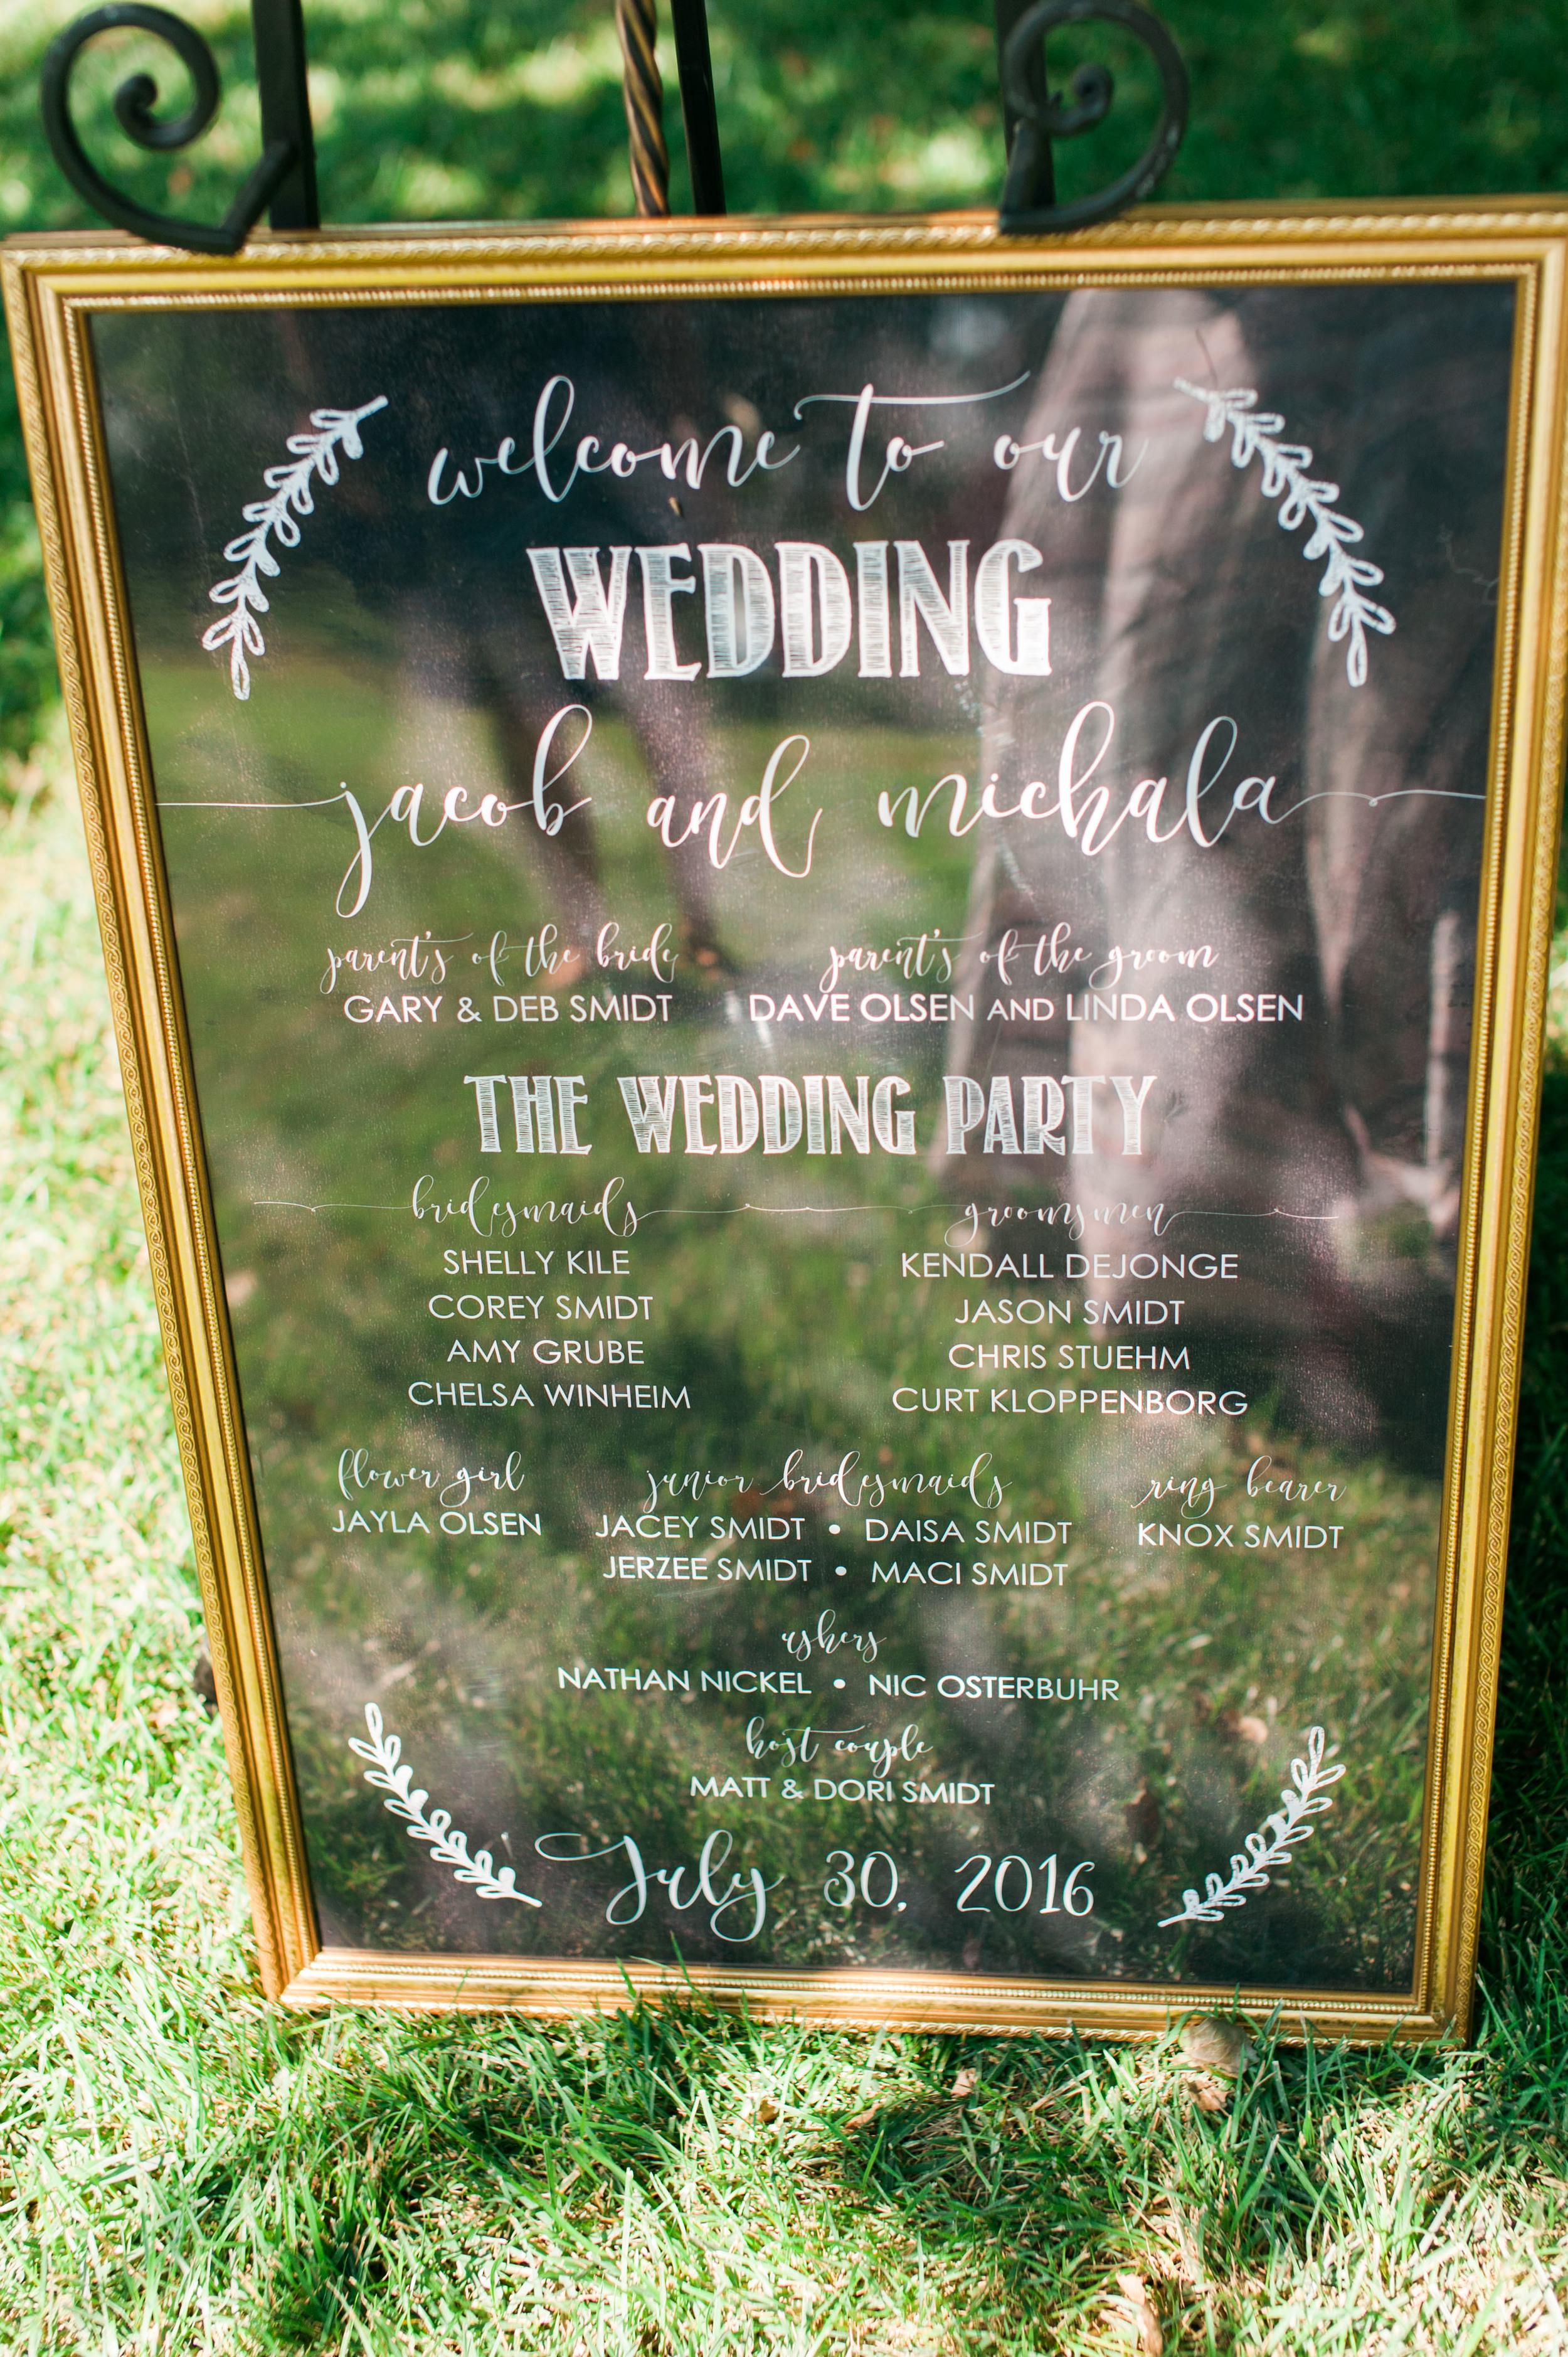 burchell's farm house wedding minden ne